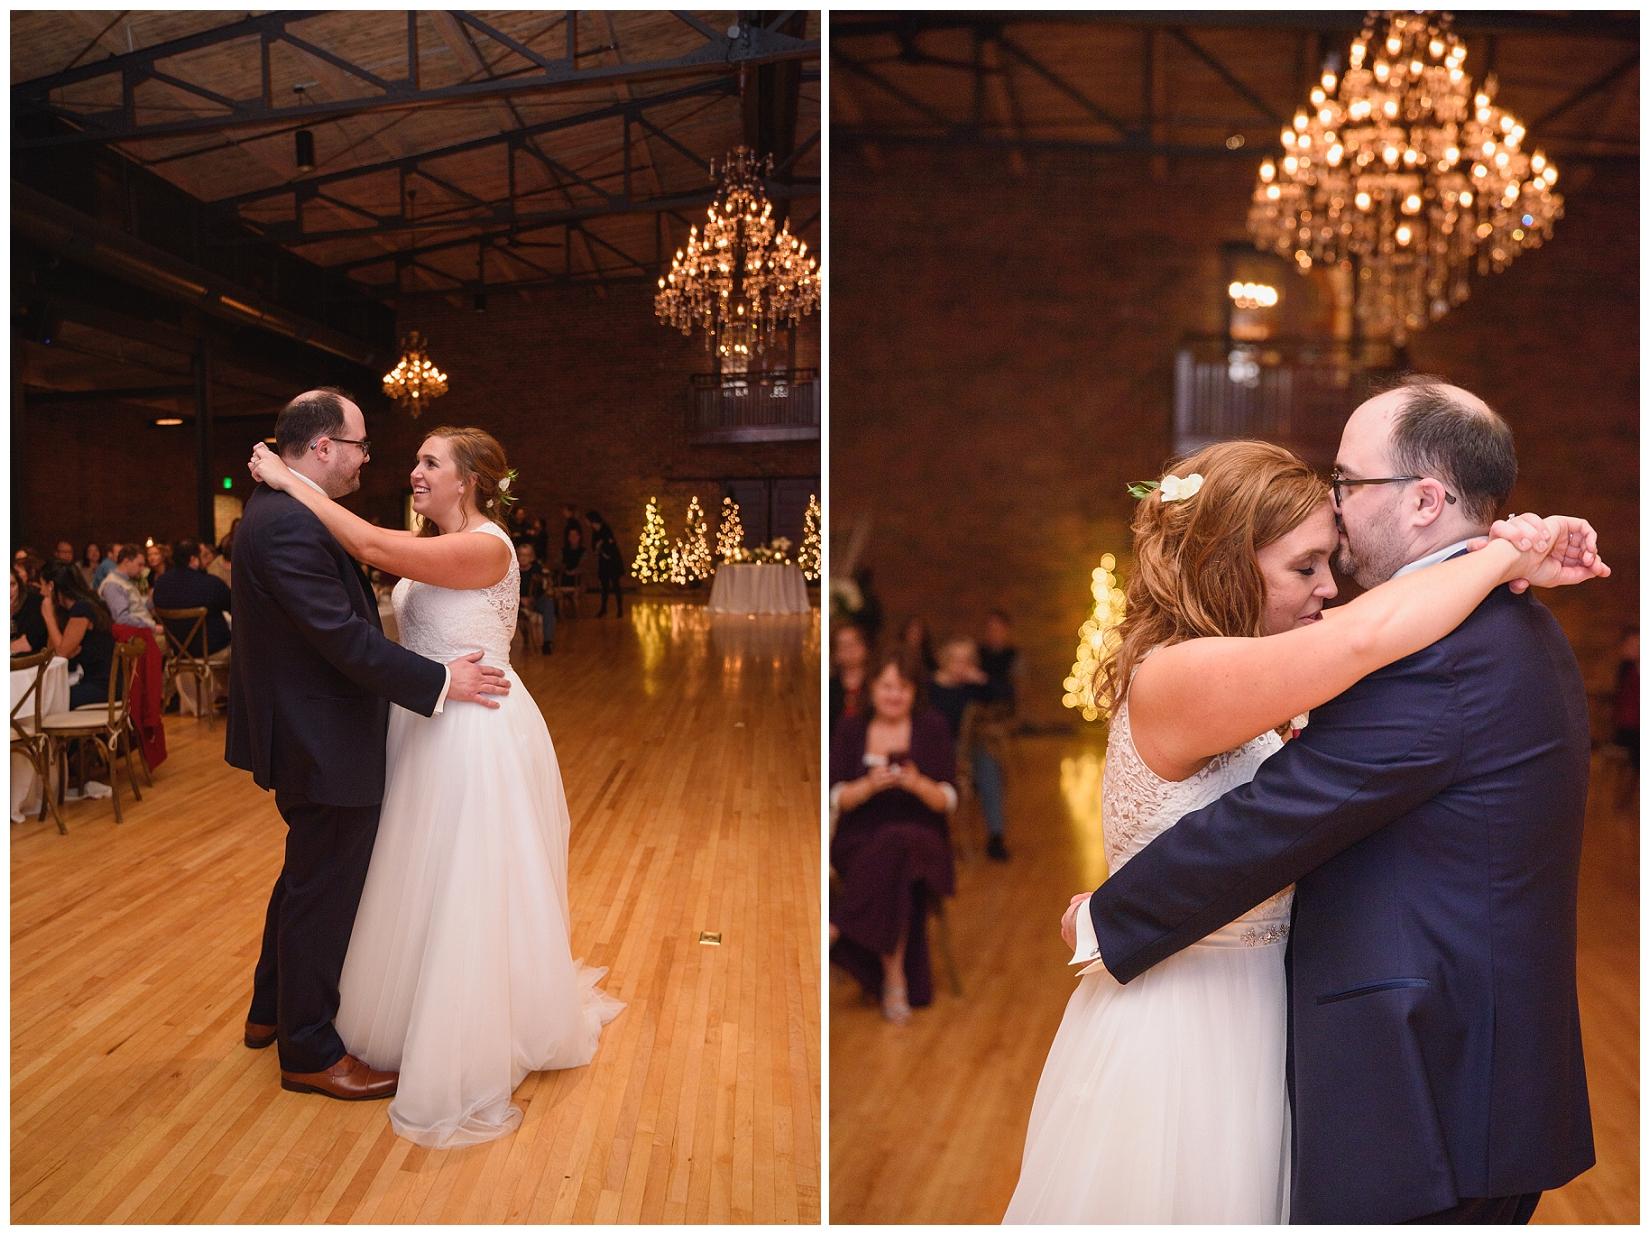 cat-alkire-wedding-photographer-indiana-chicago-indianapolis-fort-wayne_0999.jpg